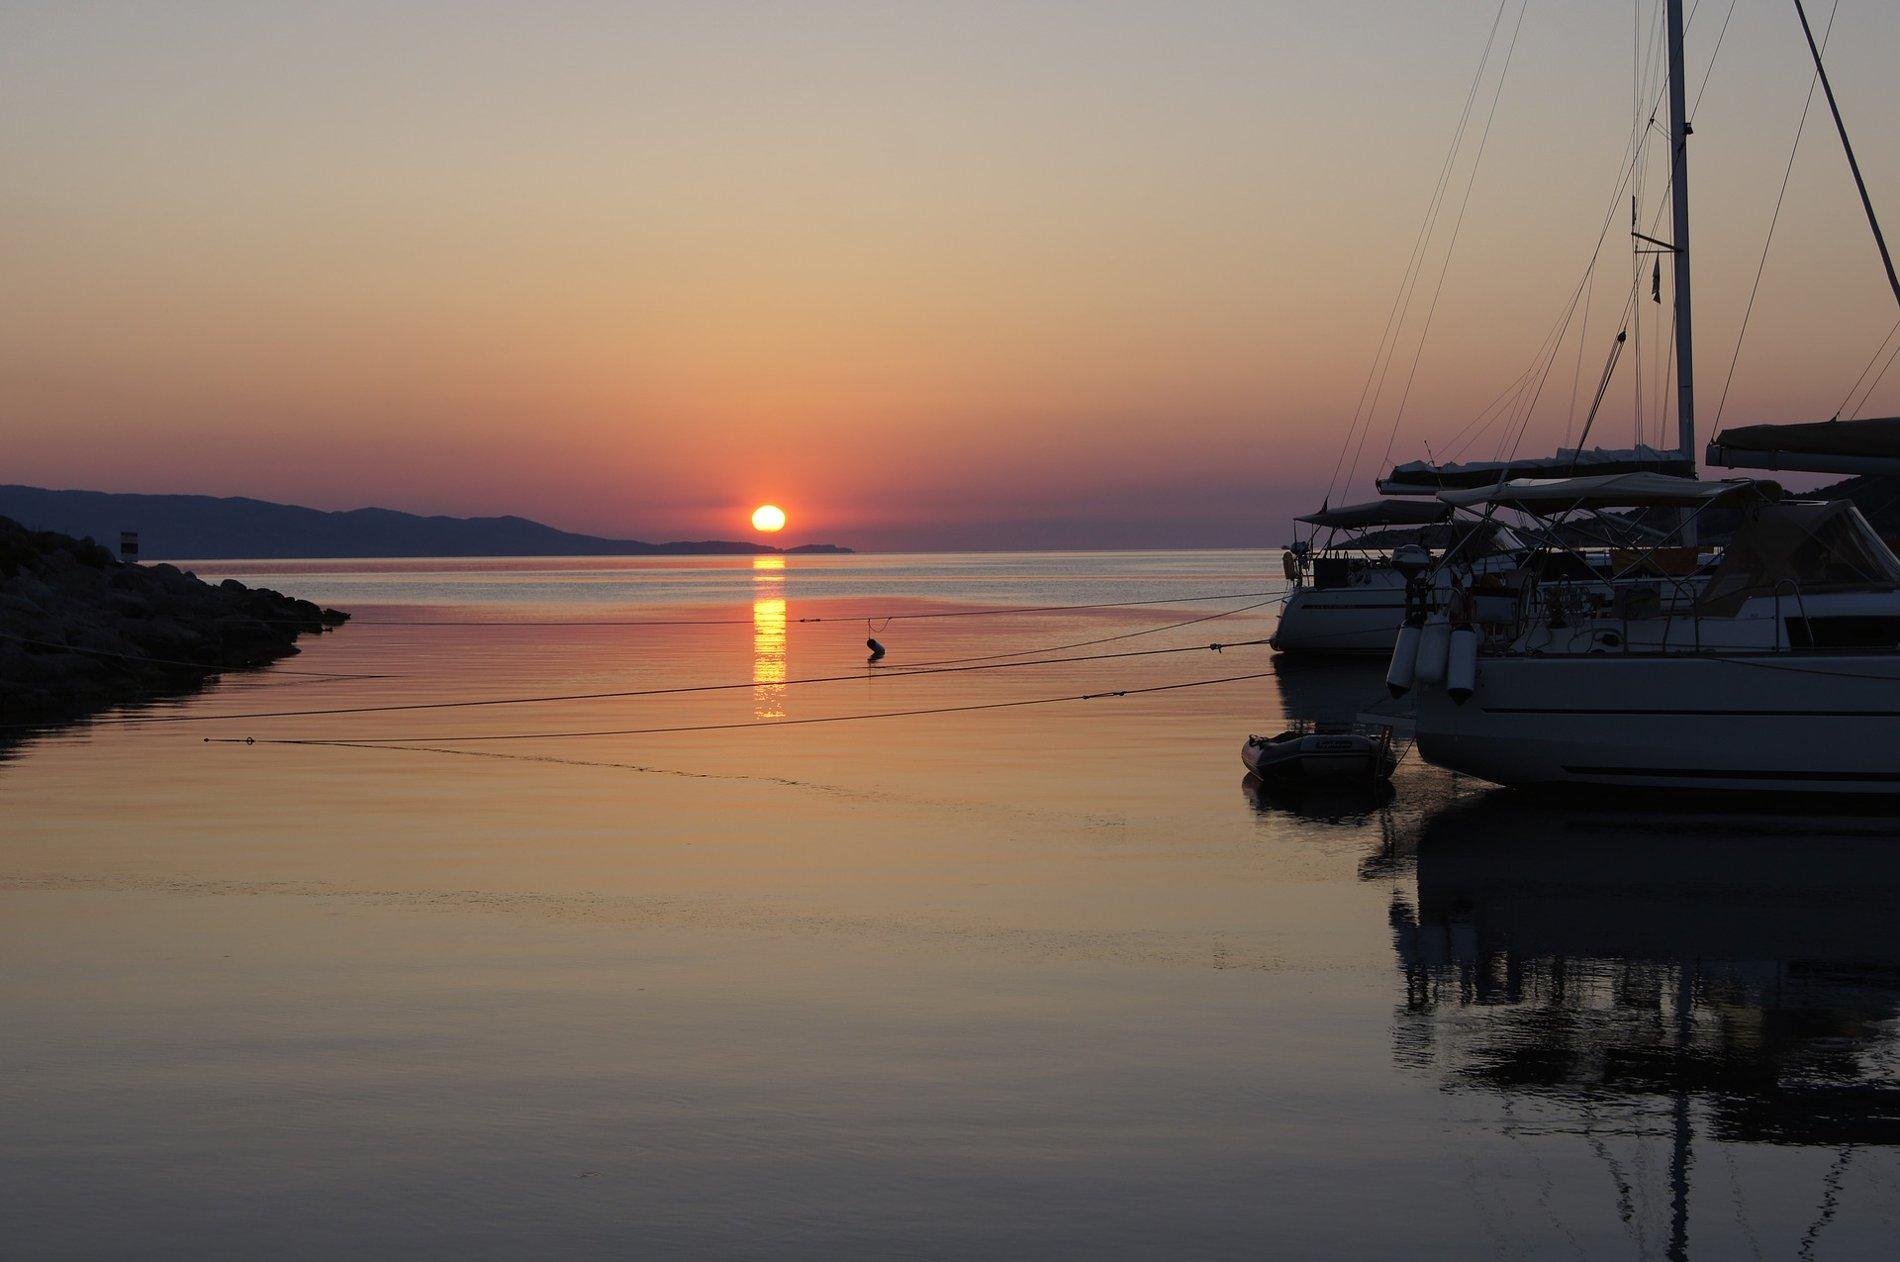 Mesmerizing sunset in Spetses island, Greece. Source: Pixabay